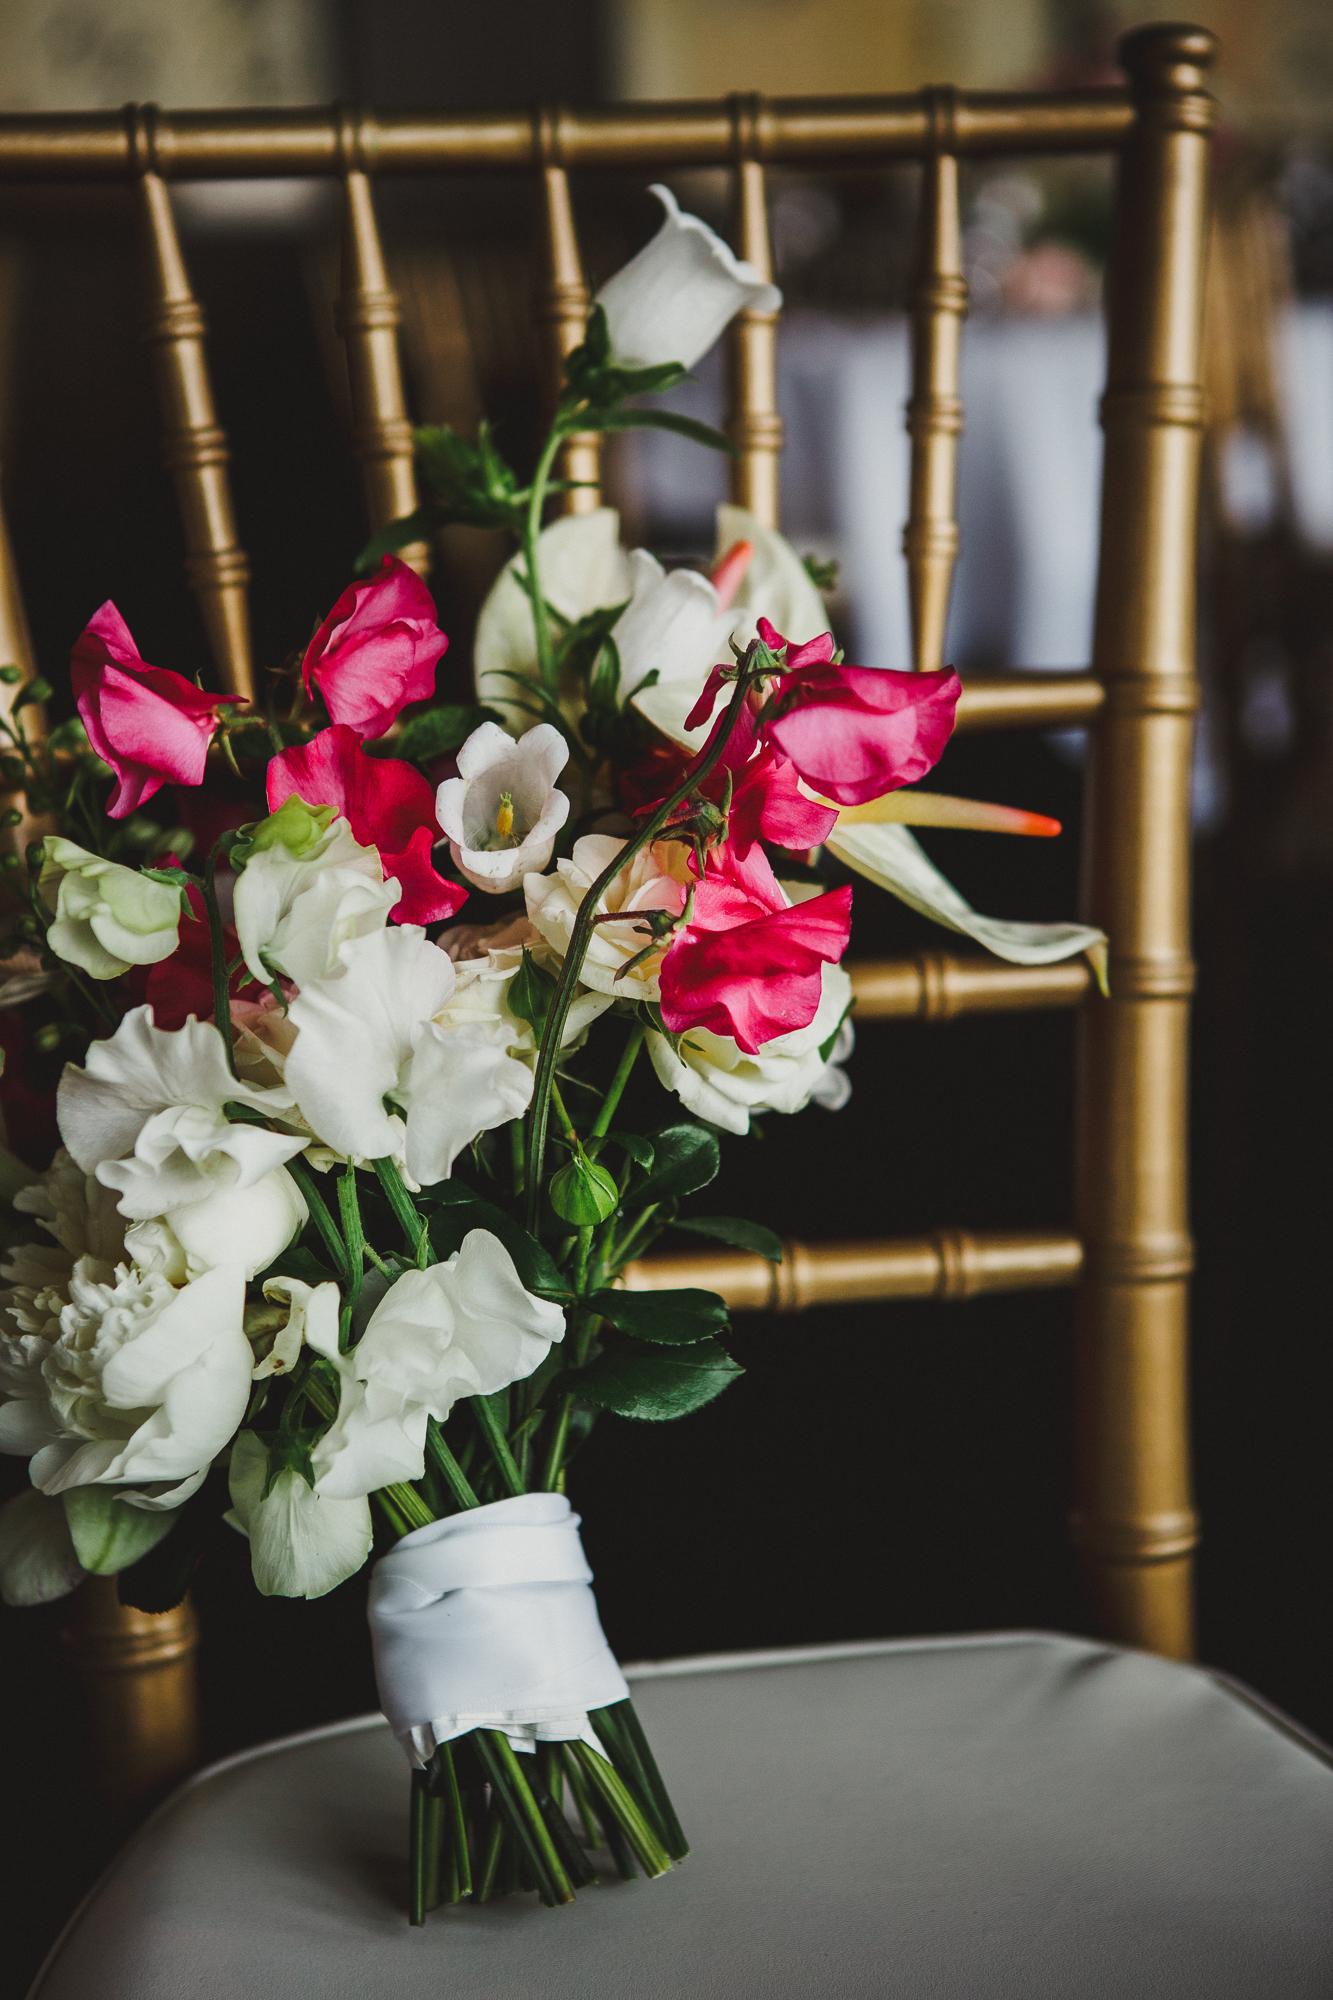 canlis restaurant wedding photos by Krista Welch-0068.jpg